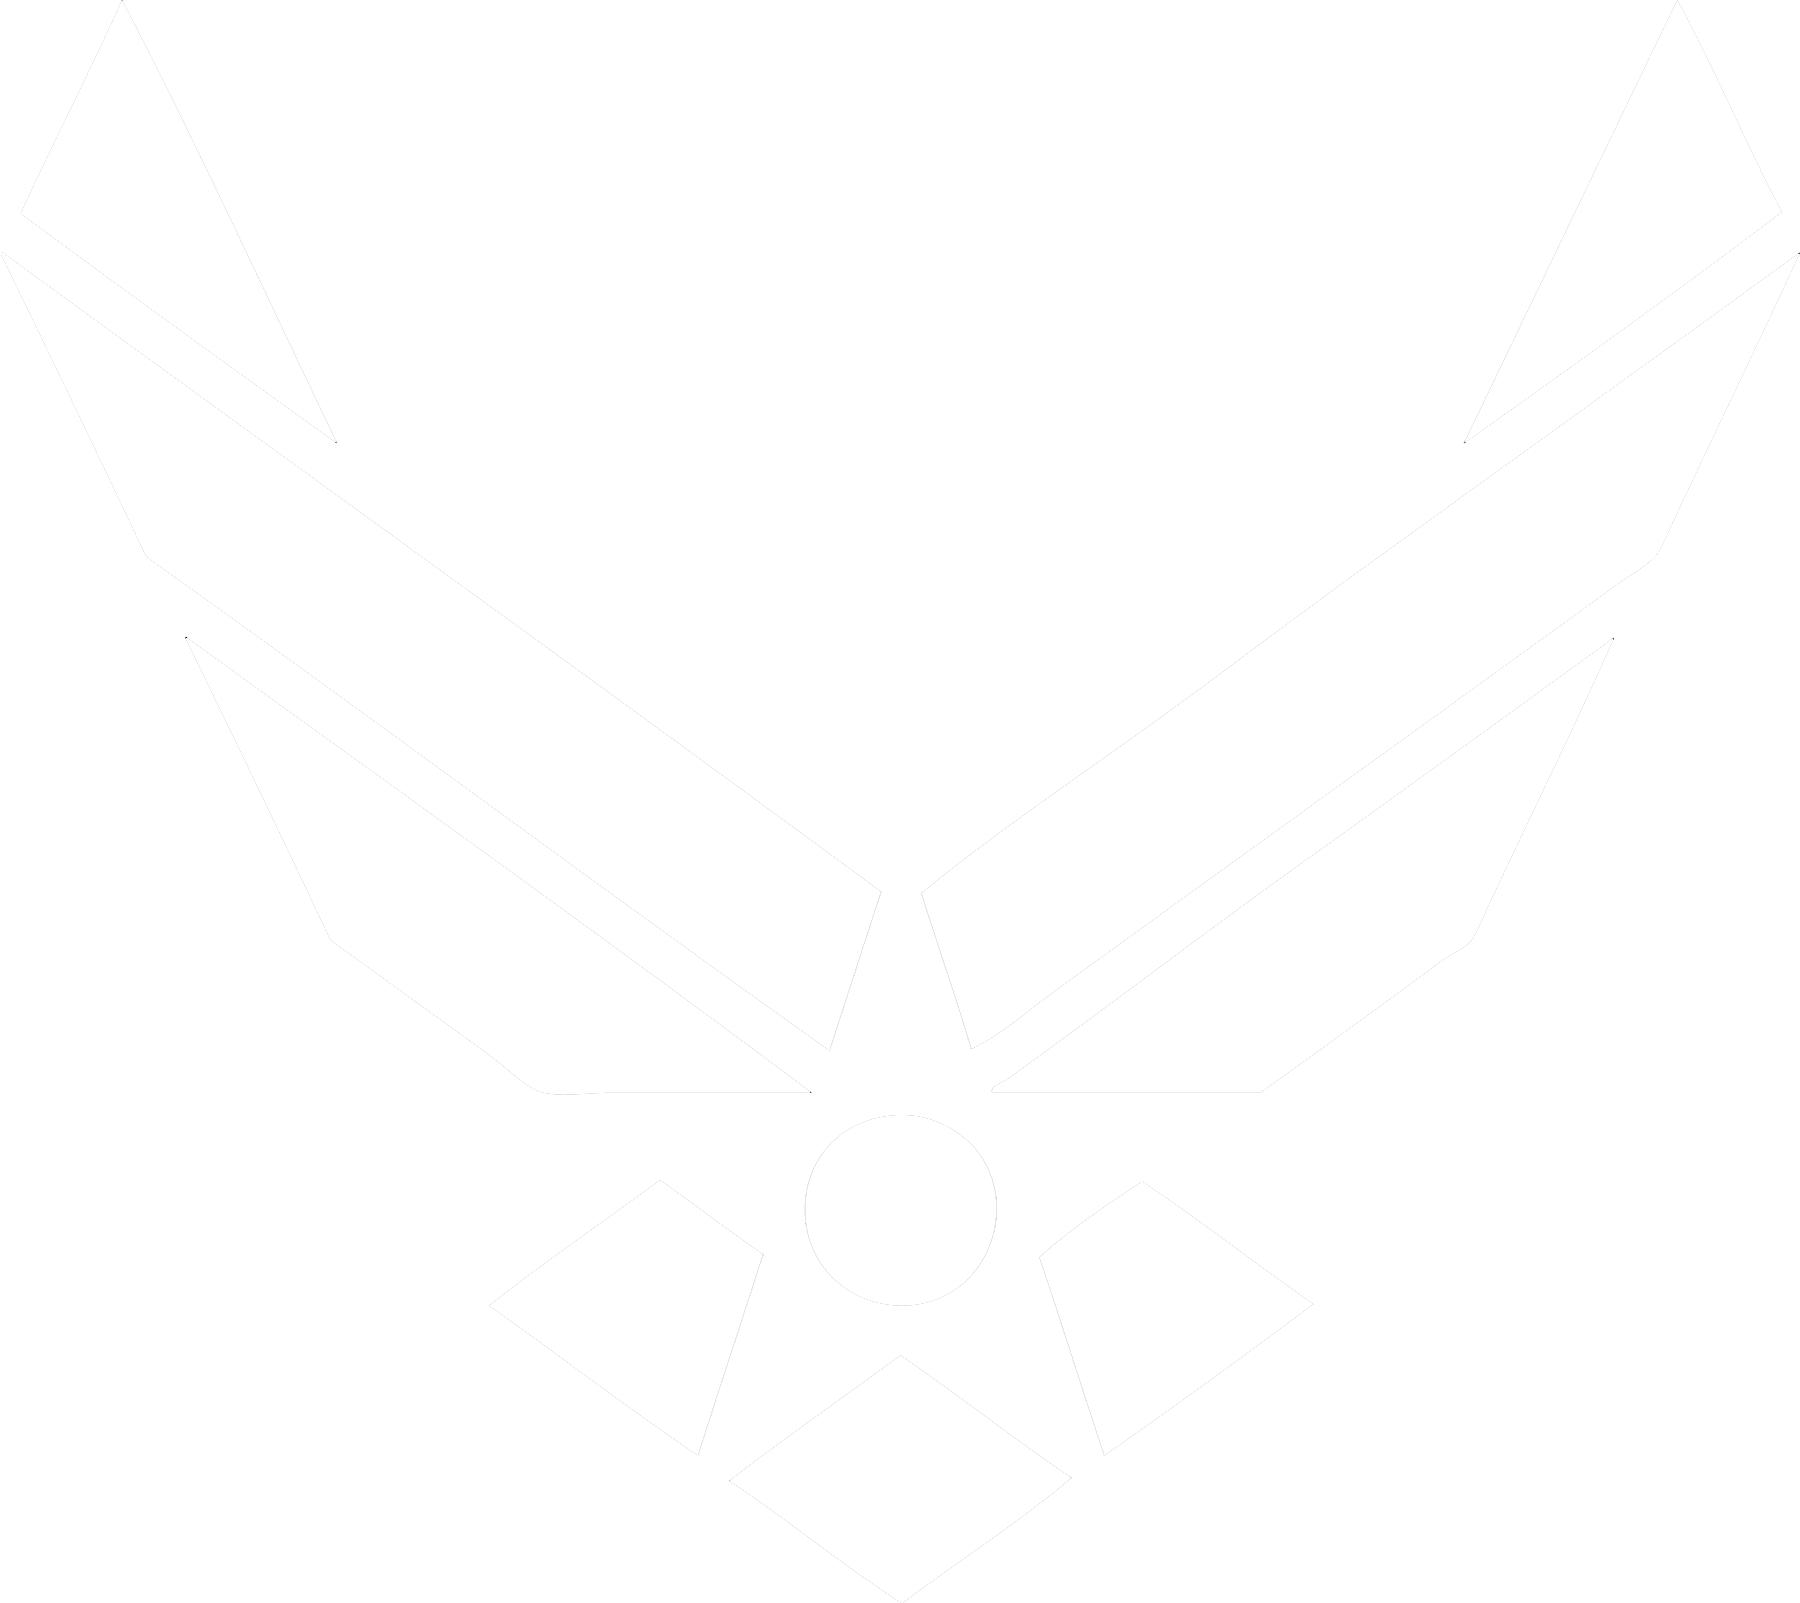 airforce_white_logo.png